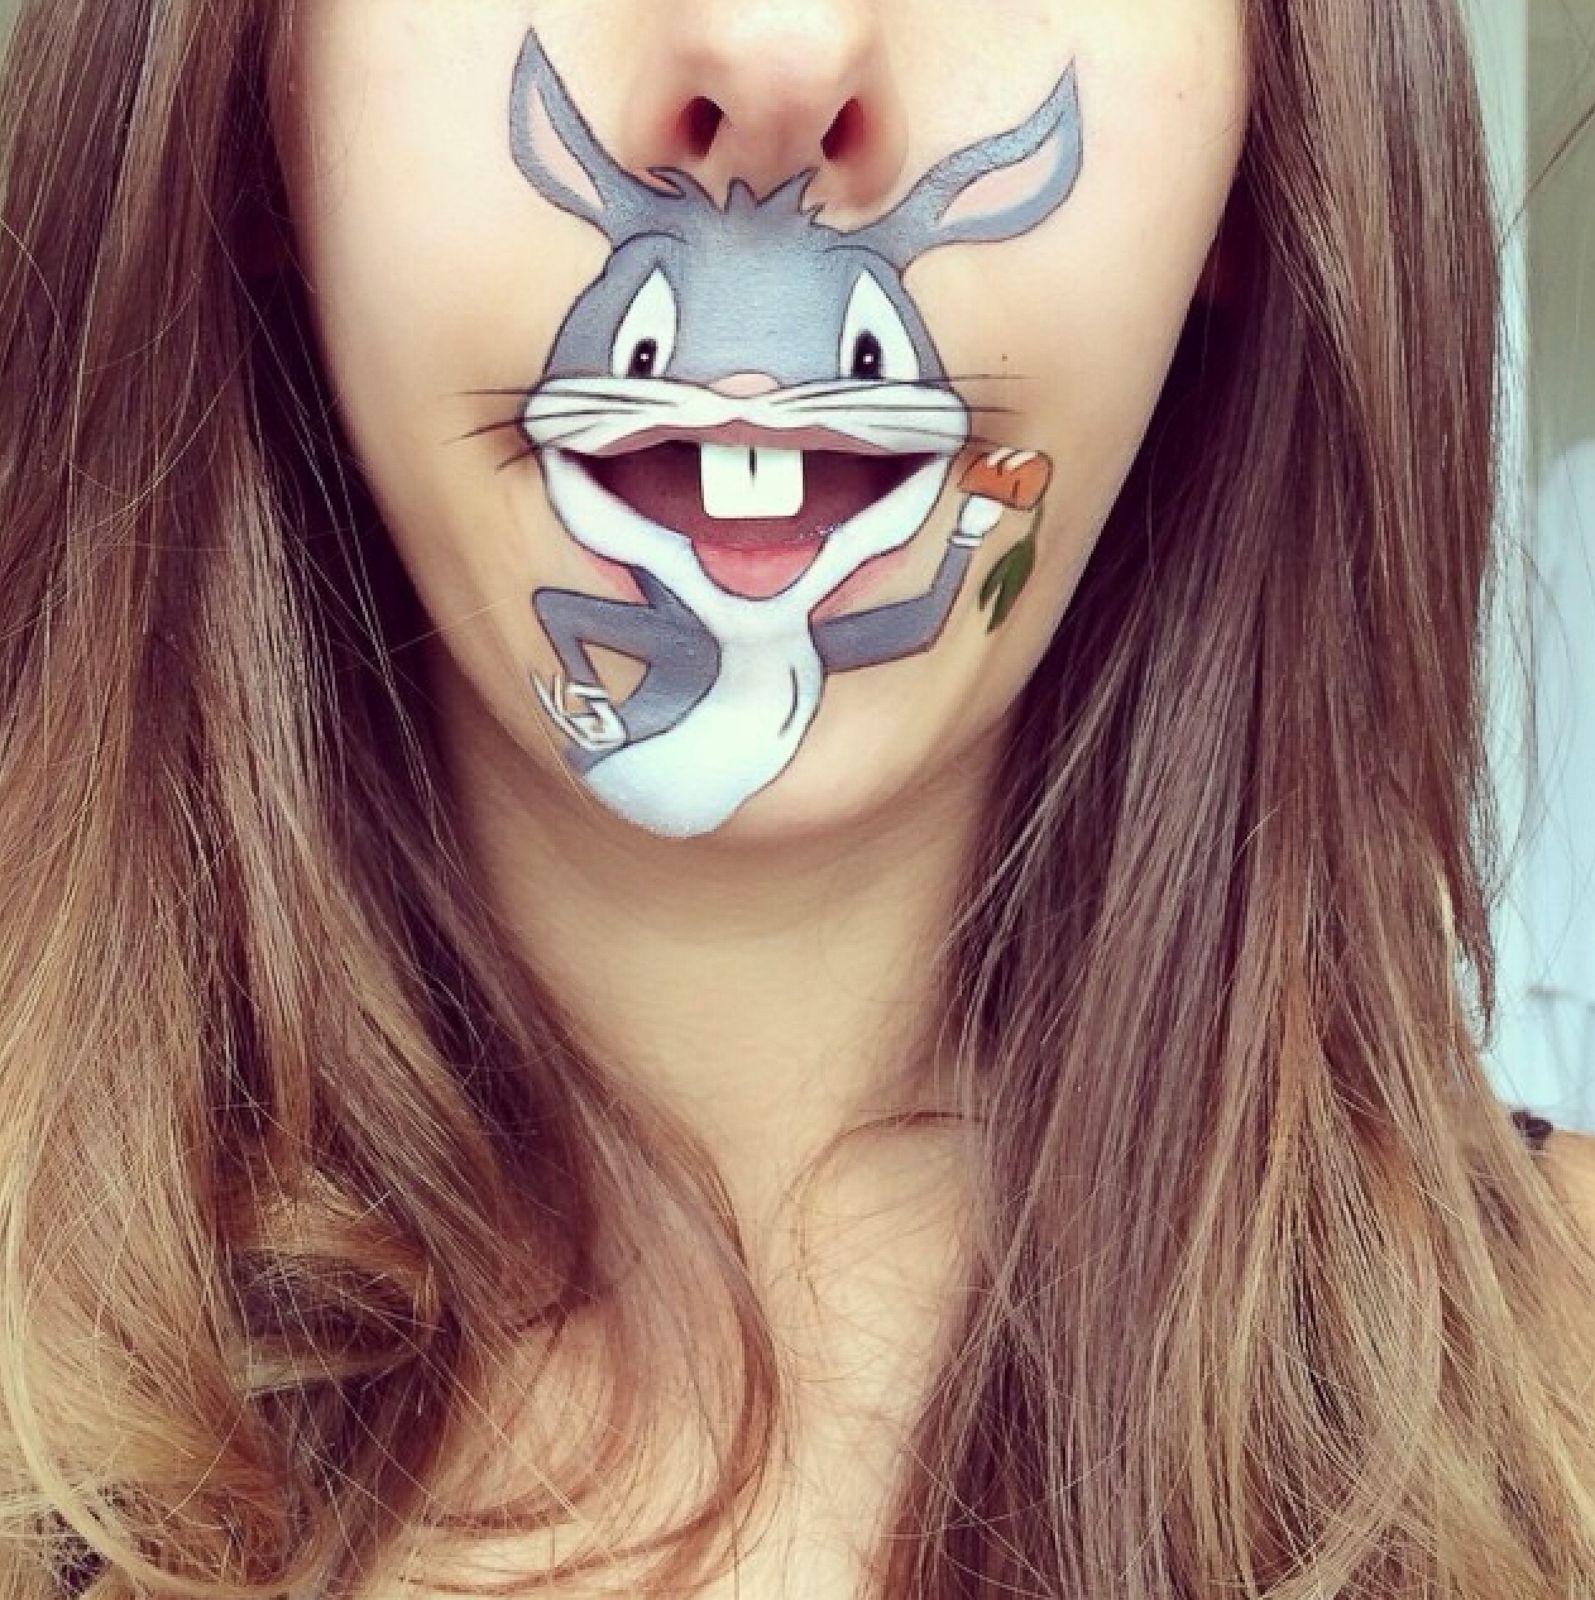 Amazing Cartoon Lip-Art By Laura Jenkinson 16